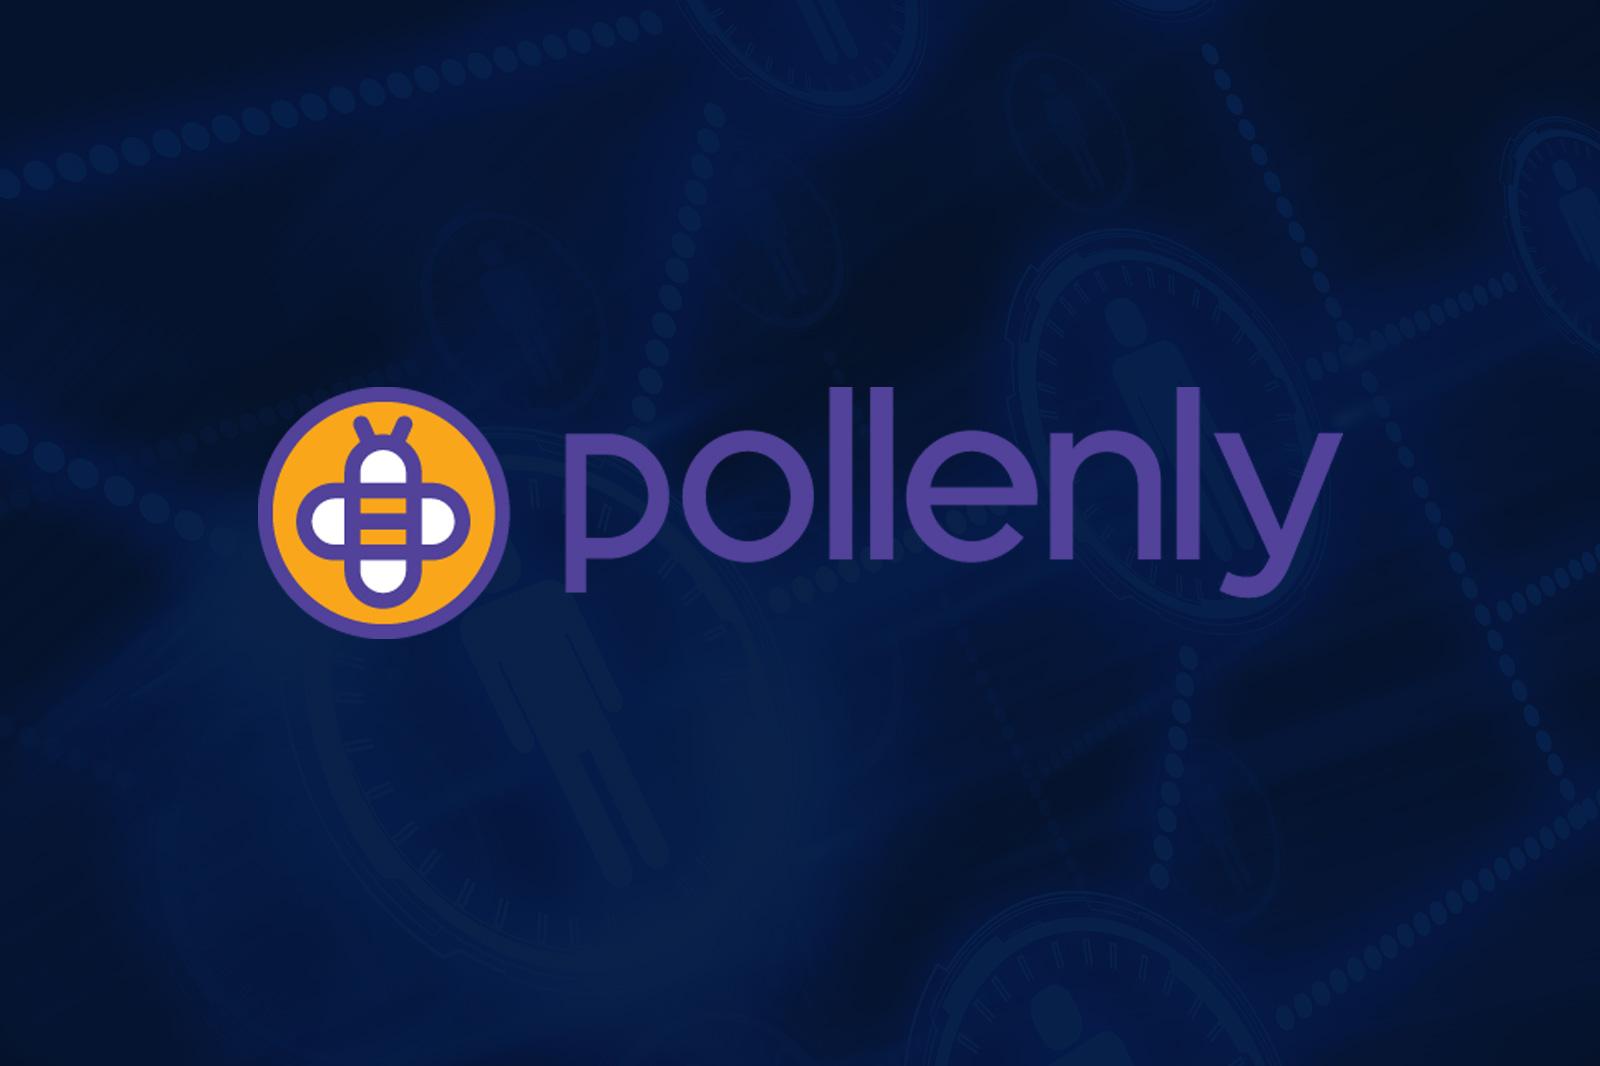 Pollenly